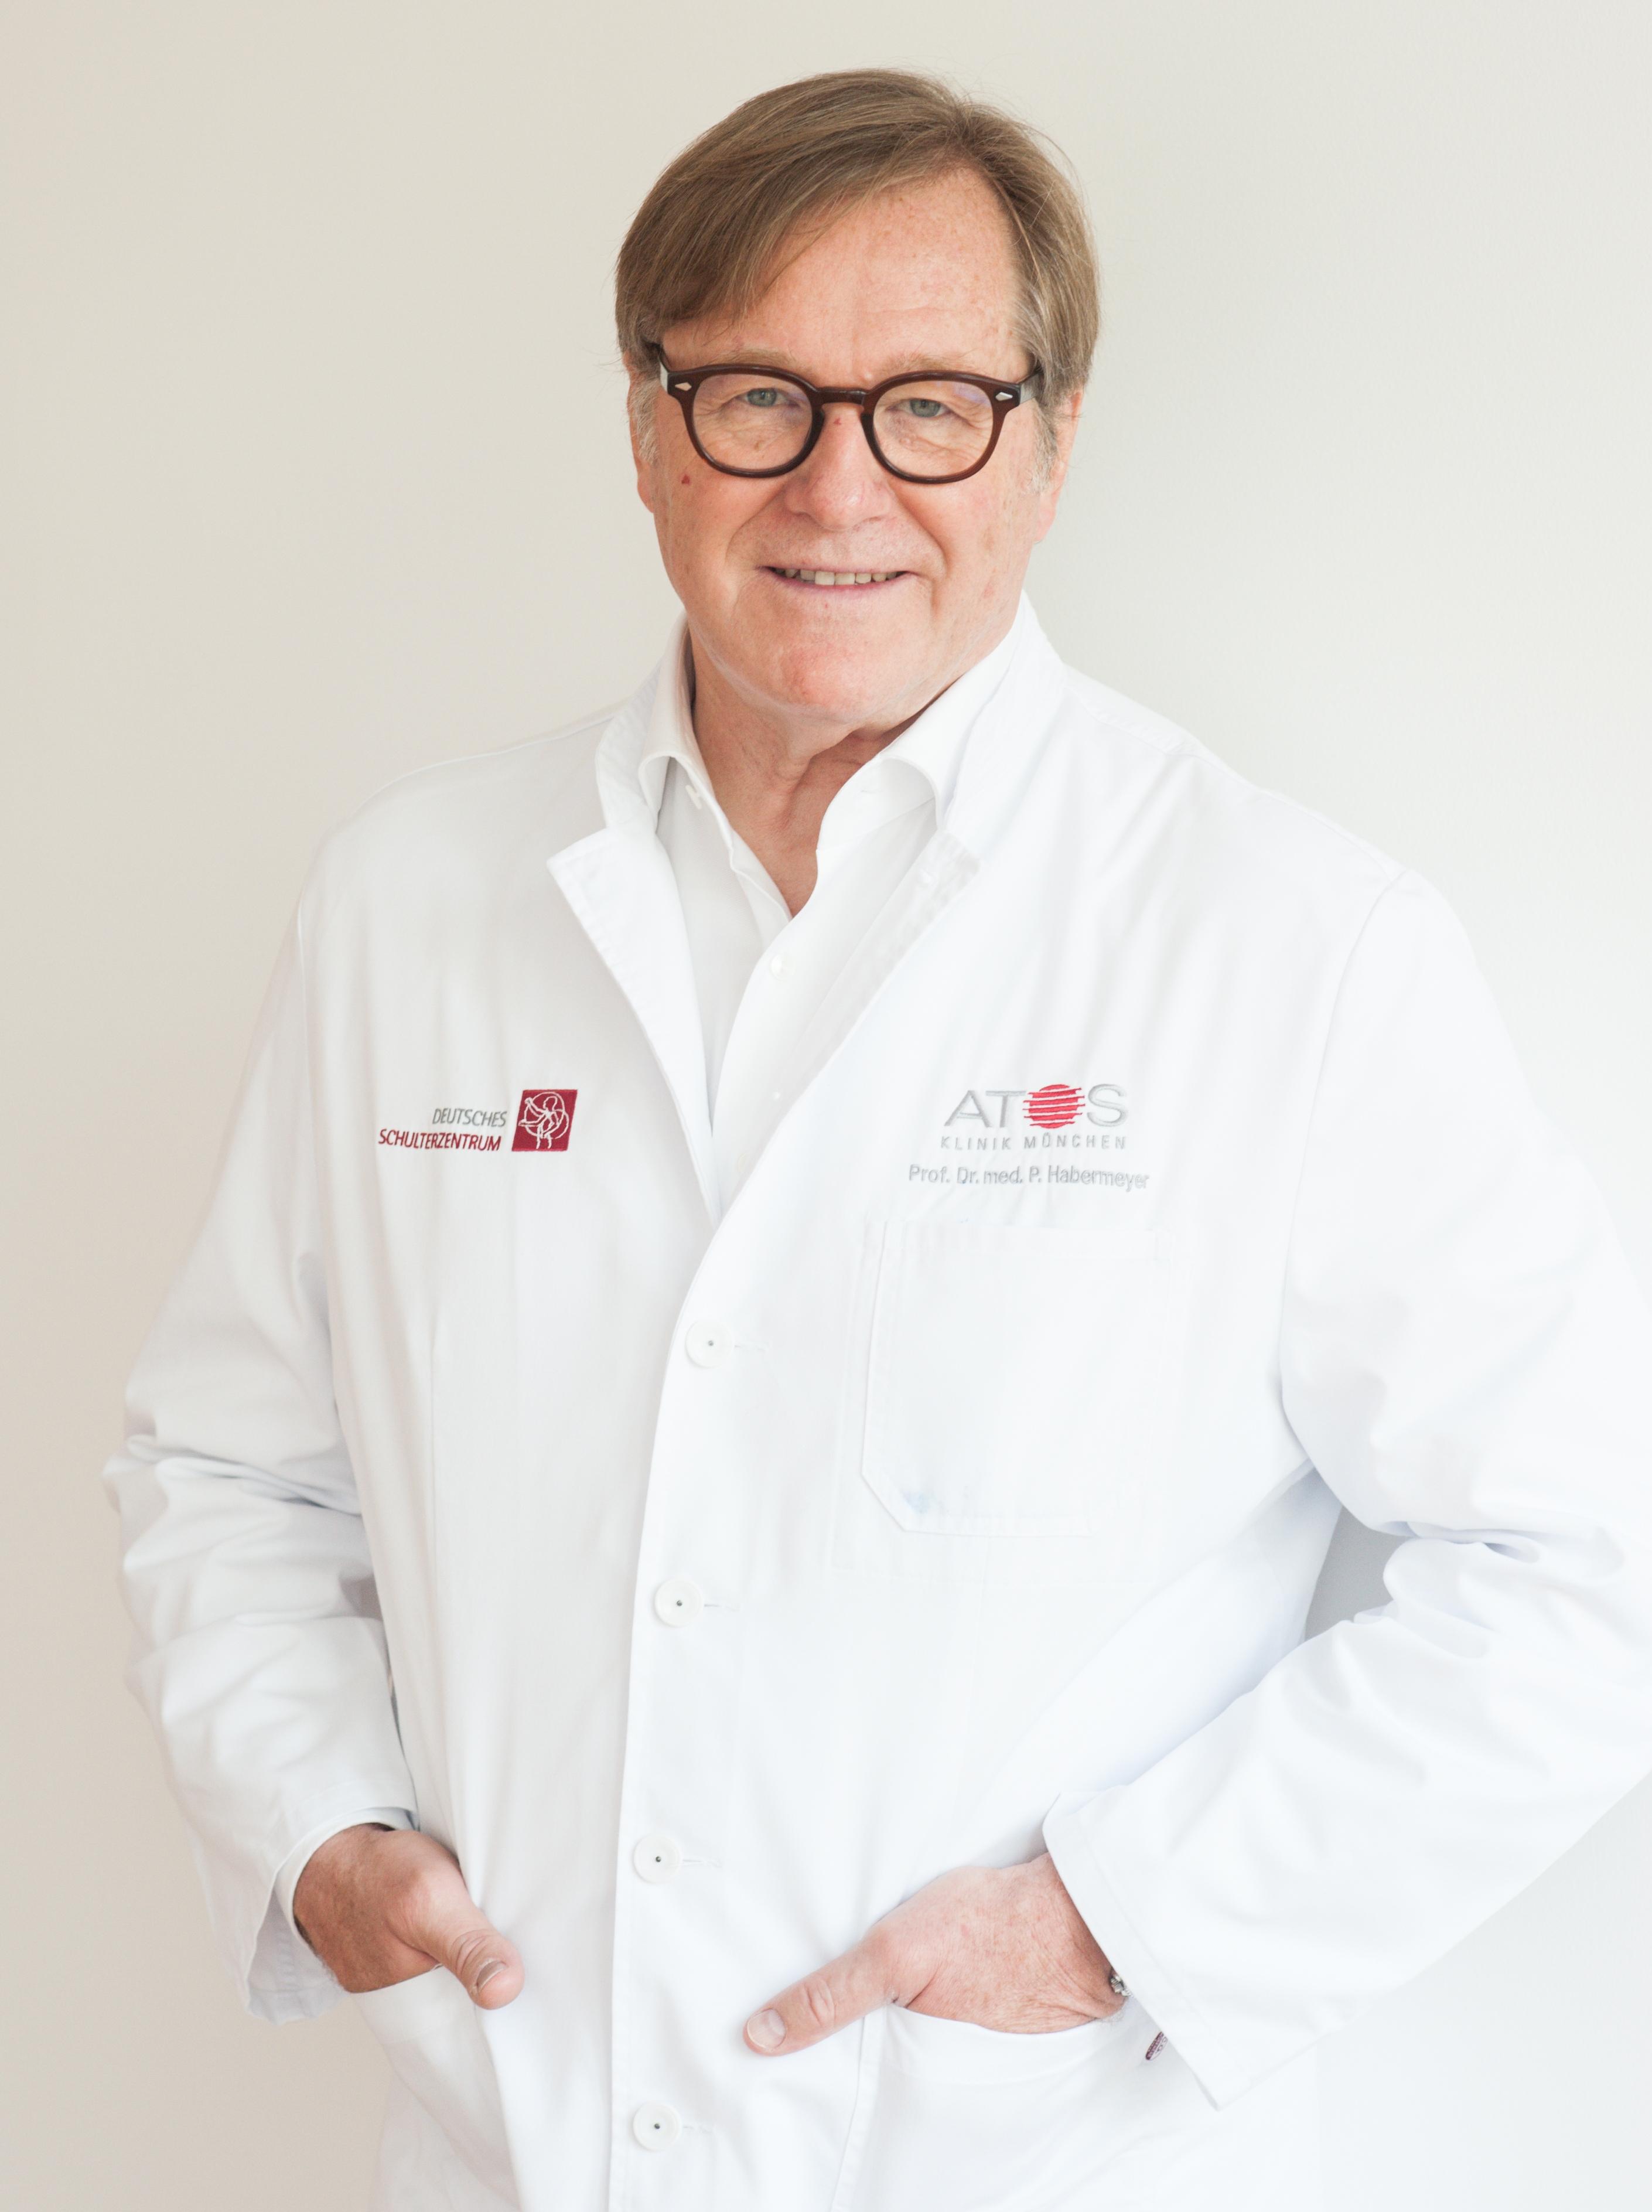 Prof. Habermeyer